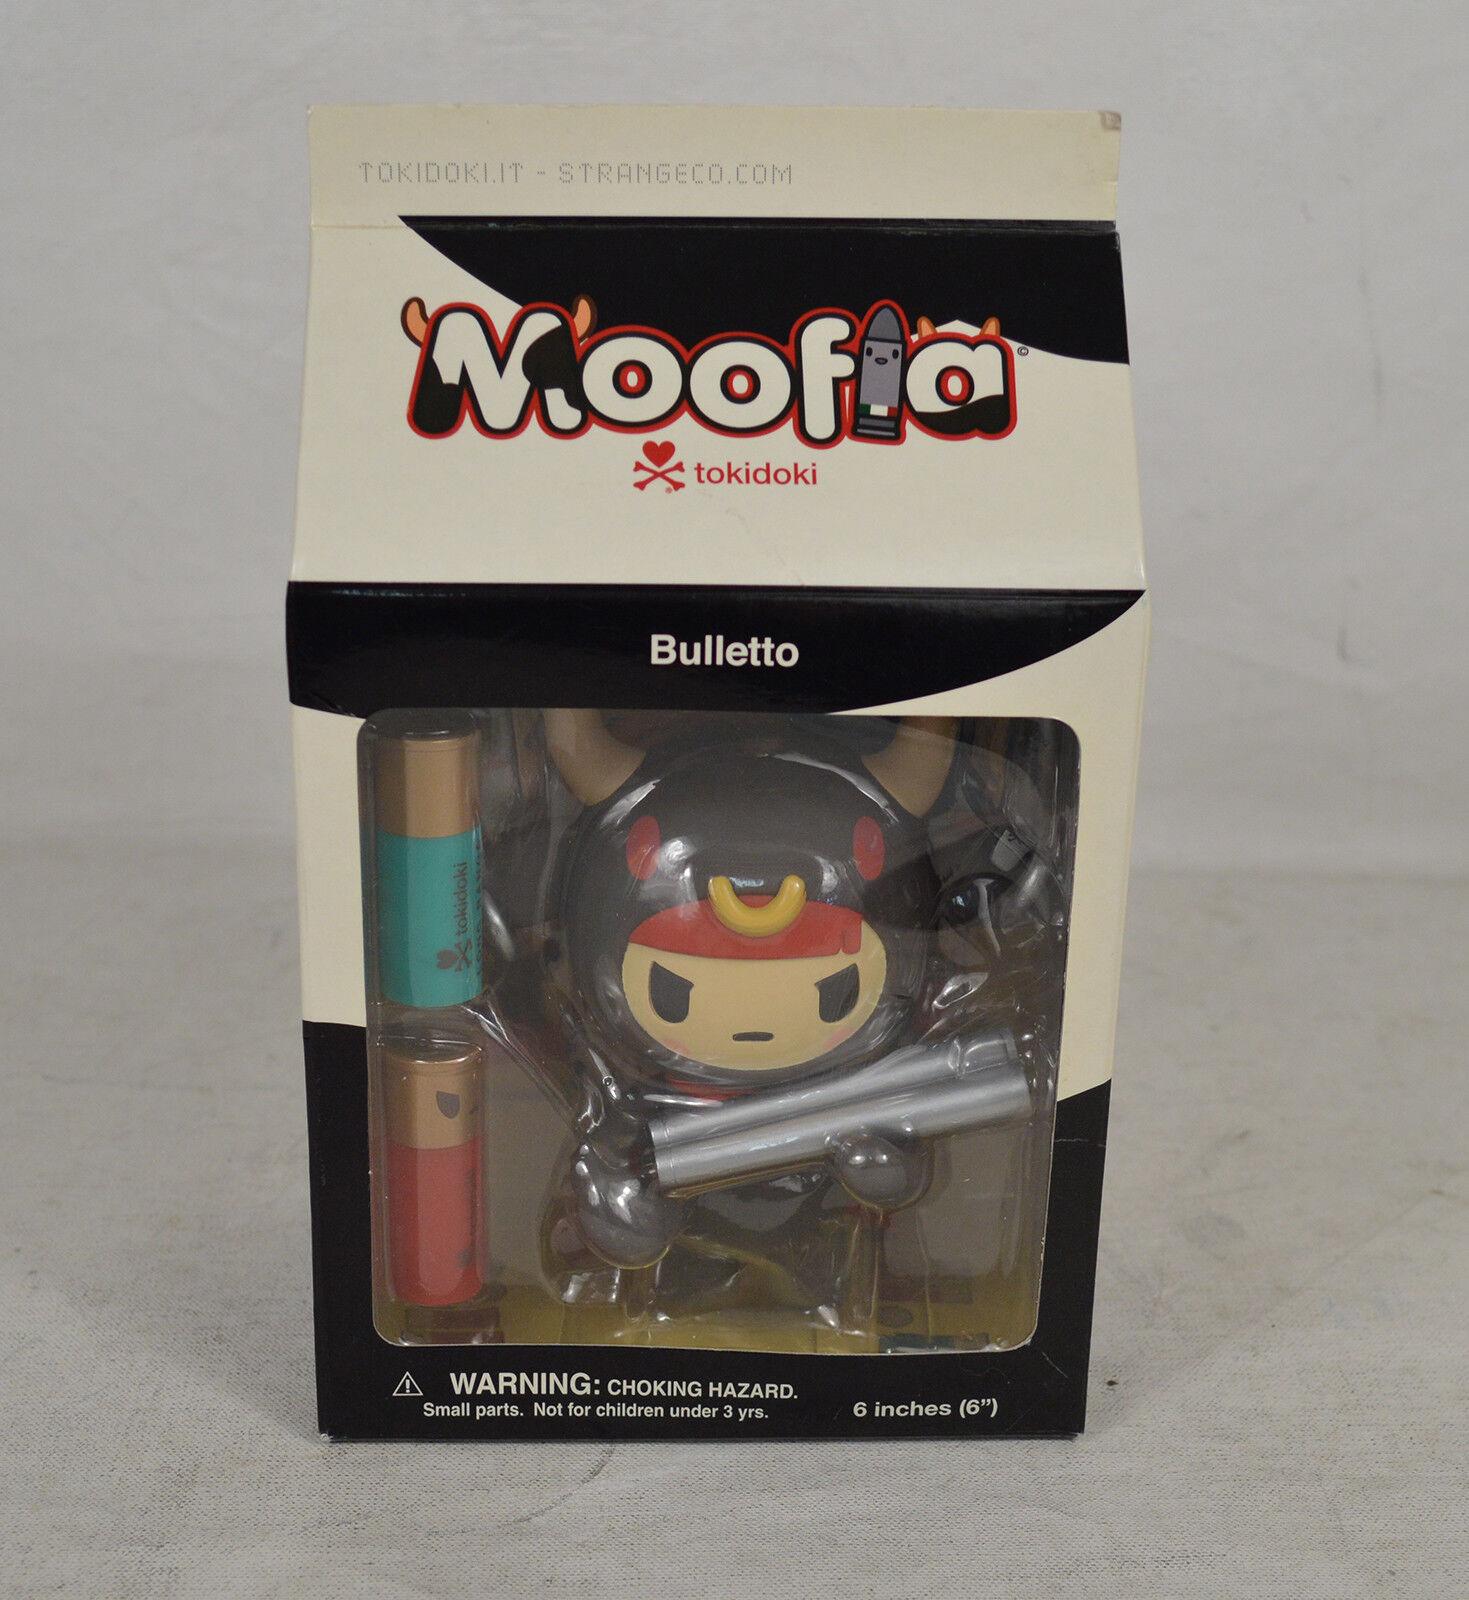 Tokidoki Moofia Bulletto Strangeco Vinyl Ction Figure 6  NIB